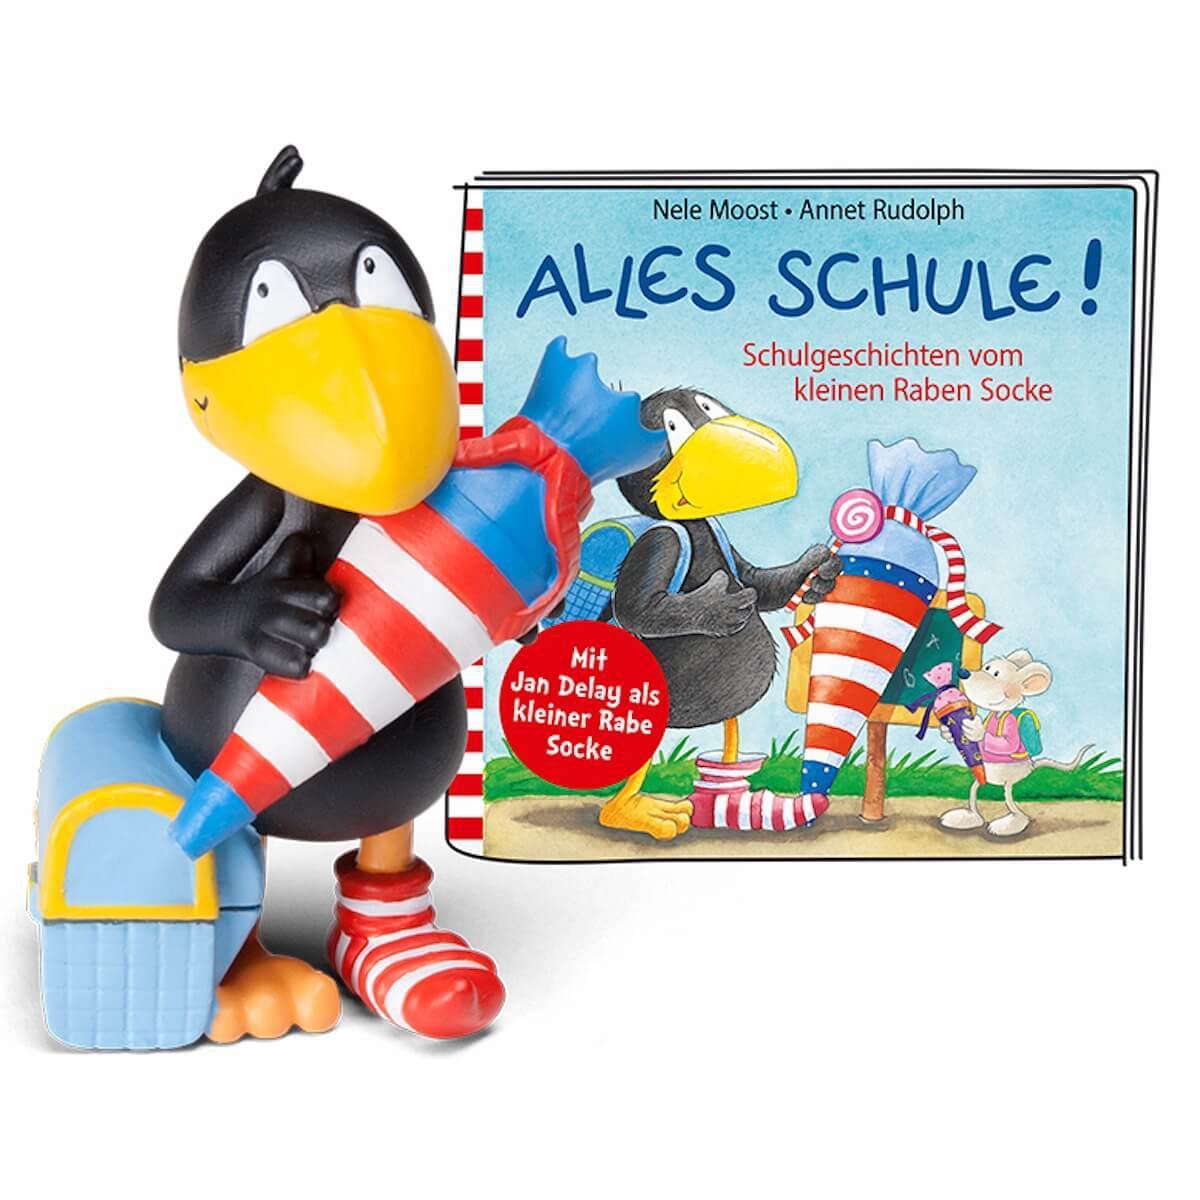 Hörspielfigur TONIES Der kleine Rabe Socke Alles Schule!